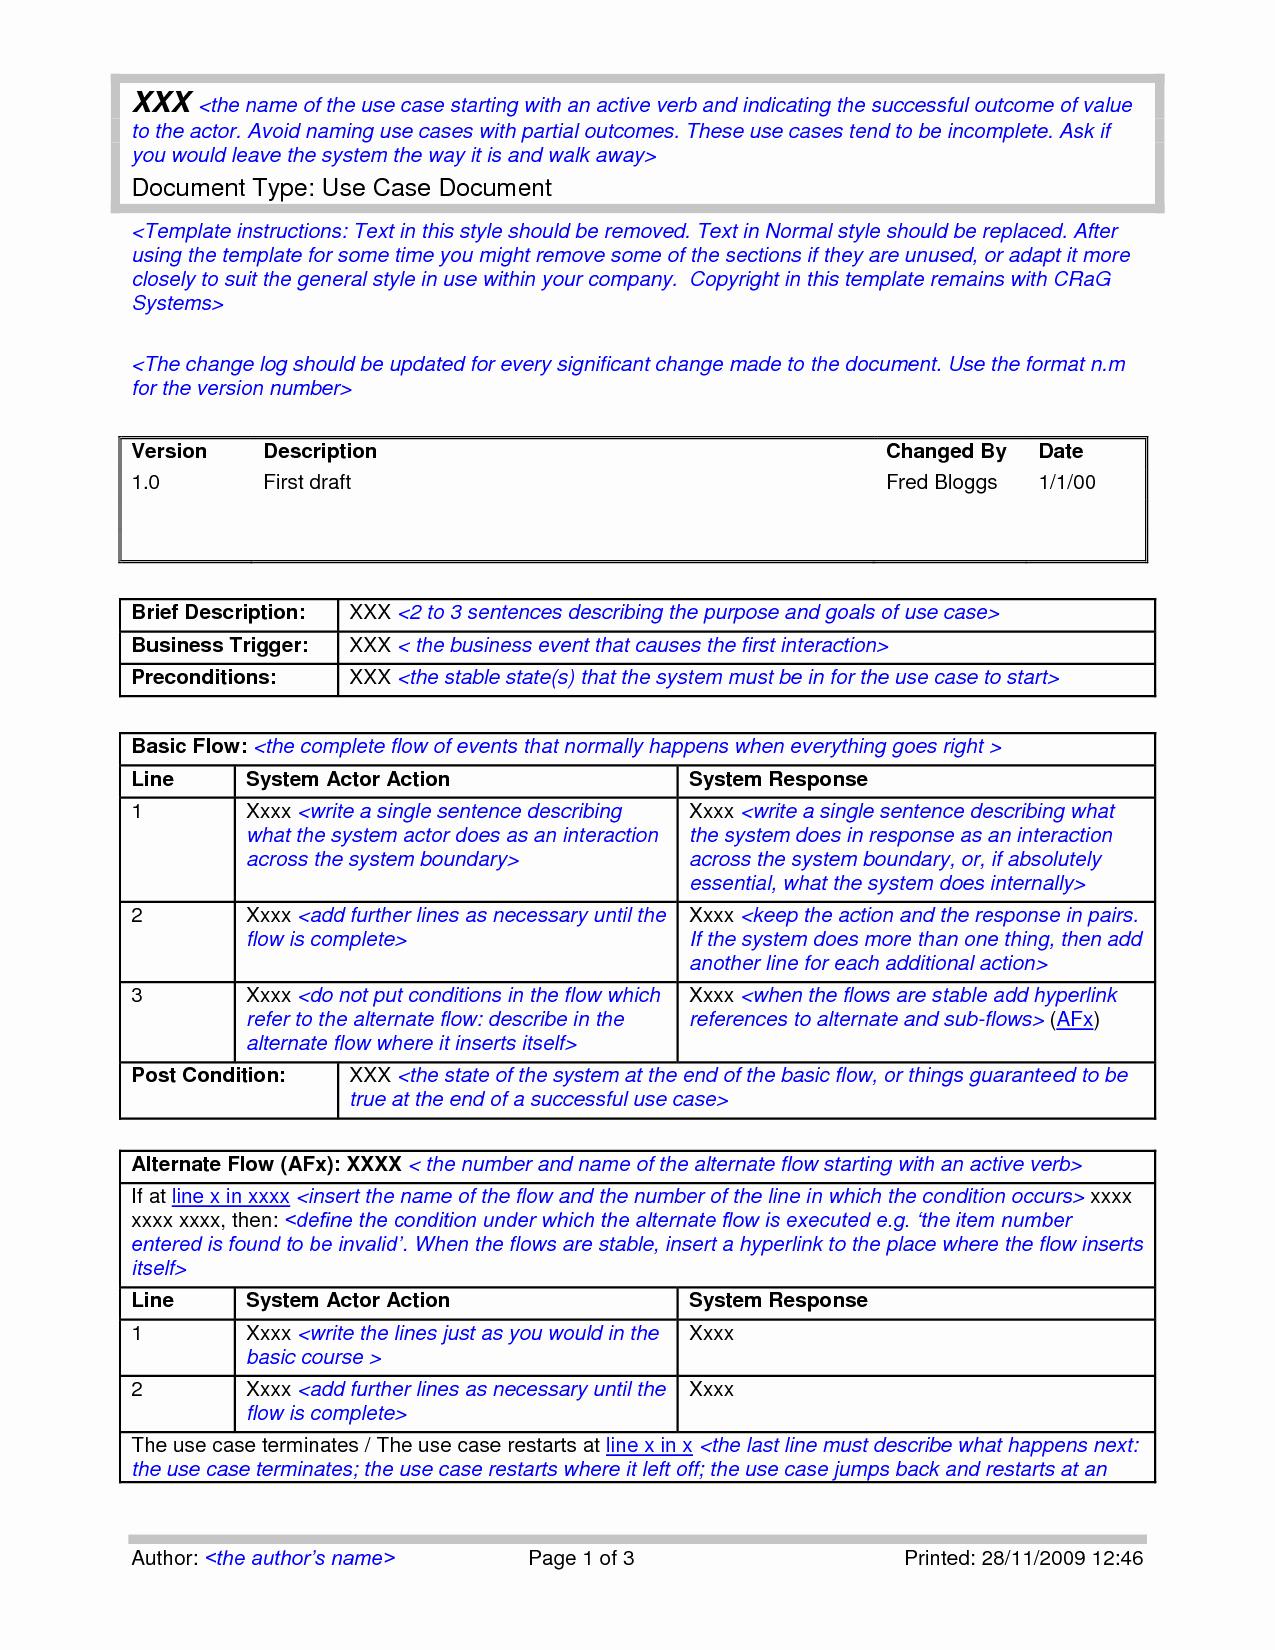 Use Case Document Template Luxury Use Case Template